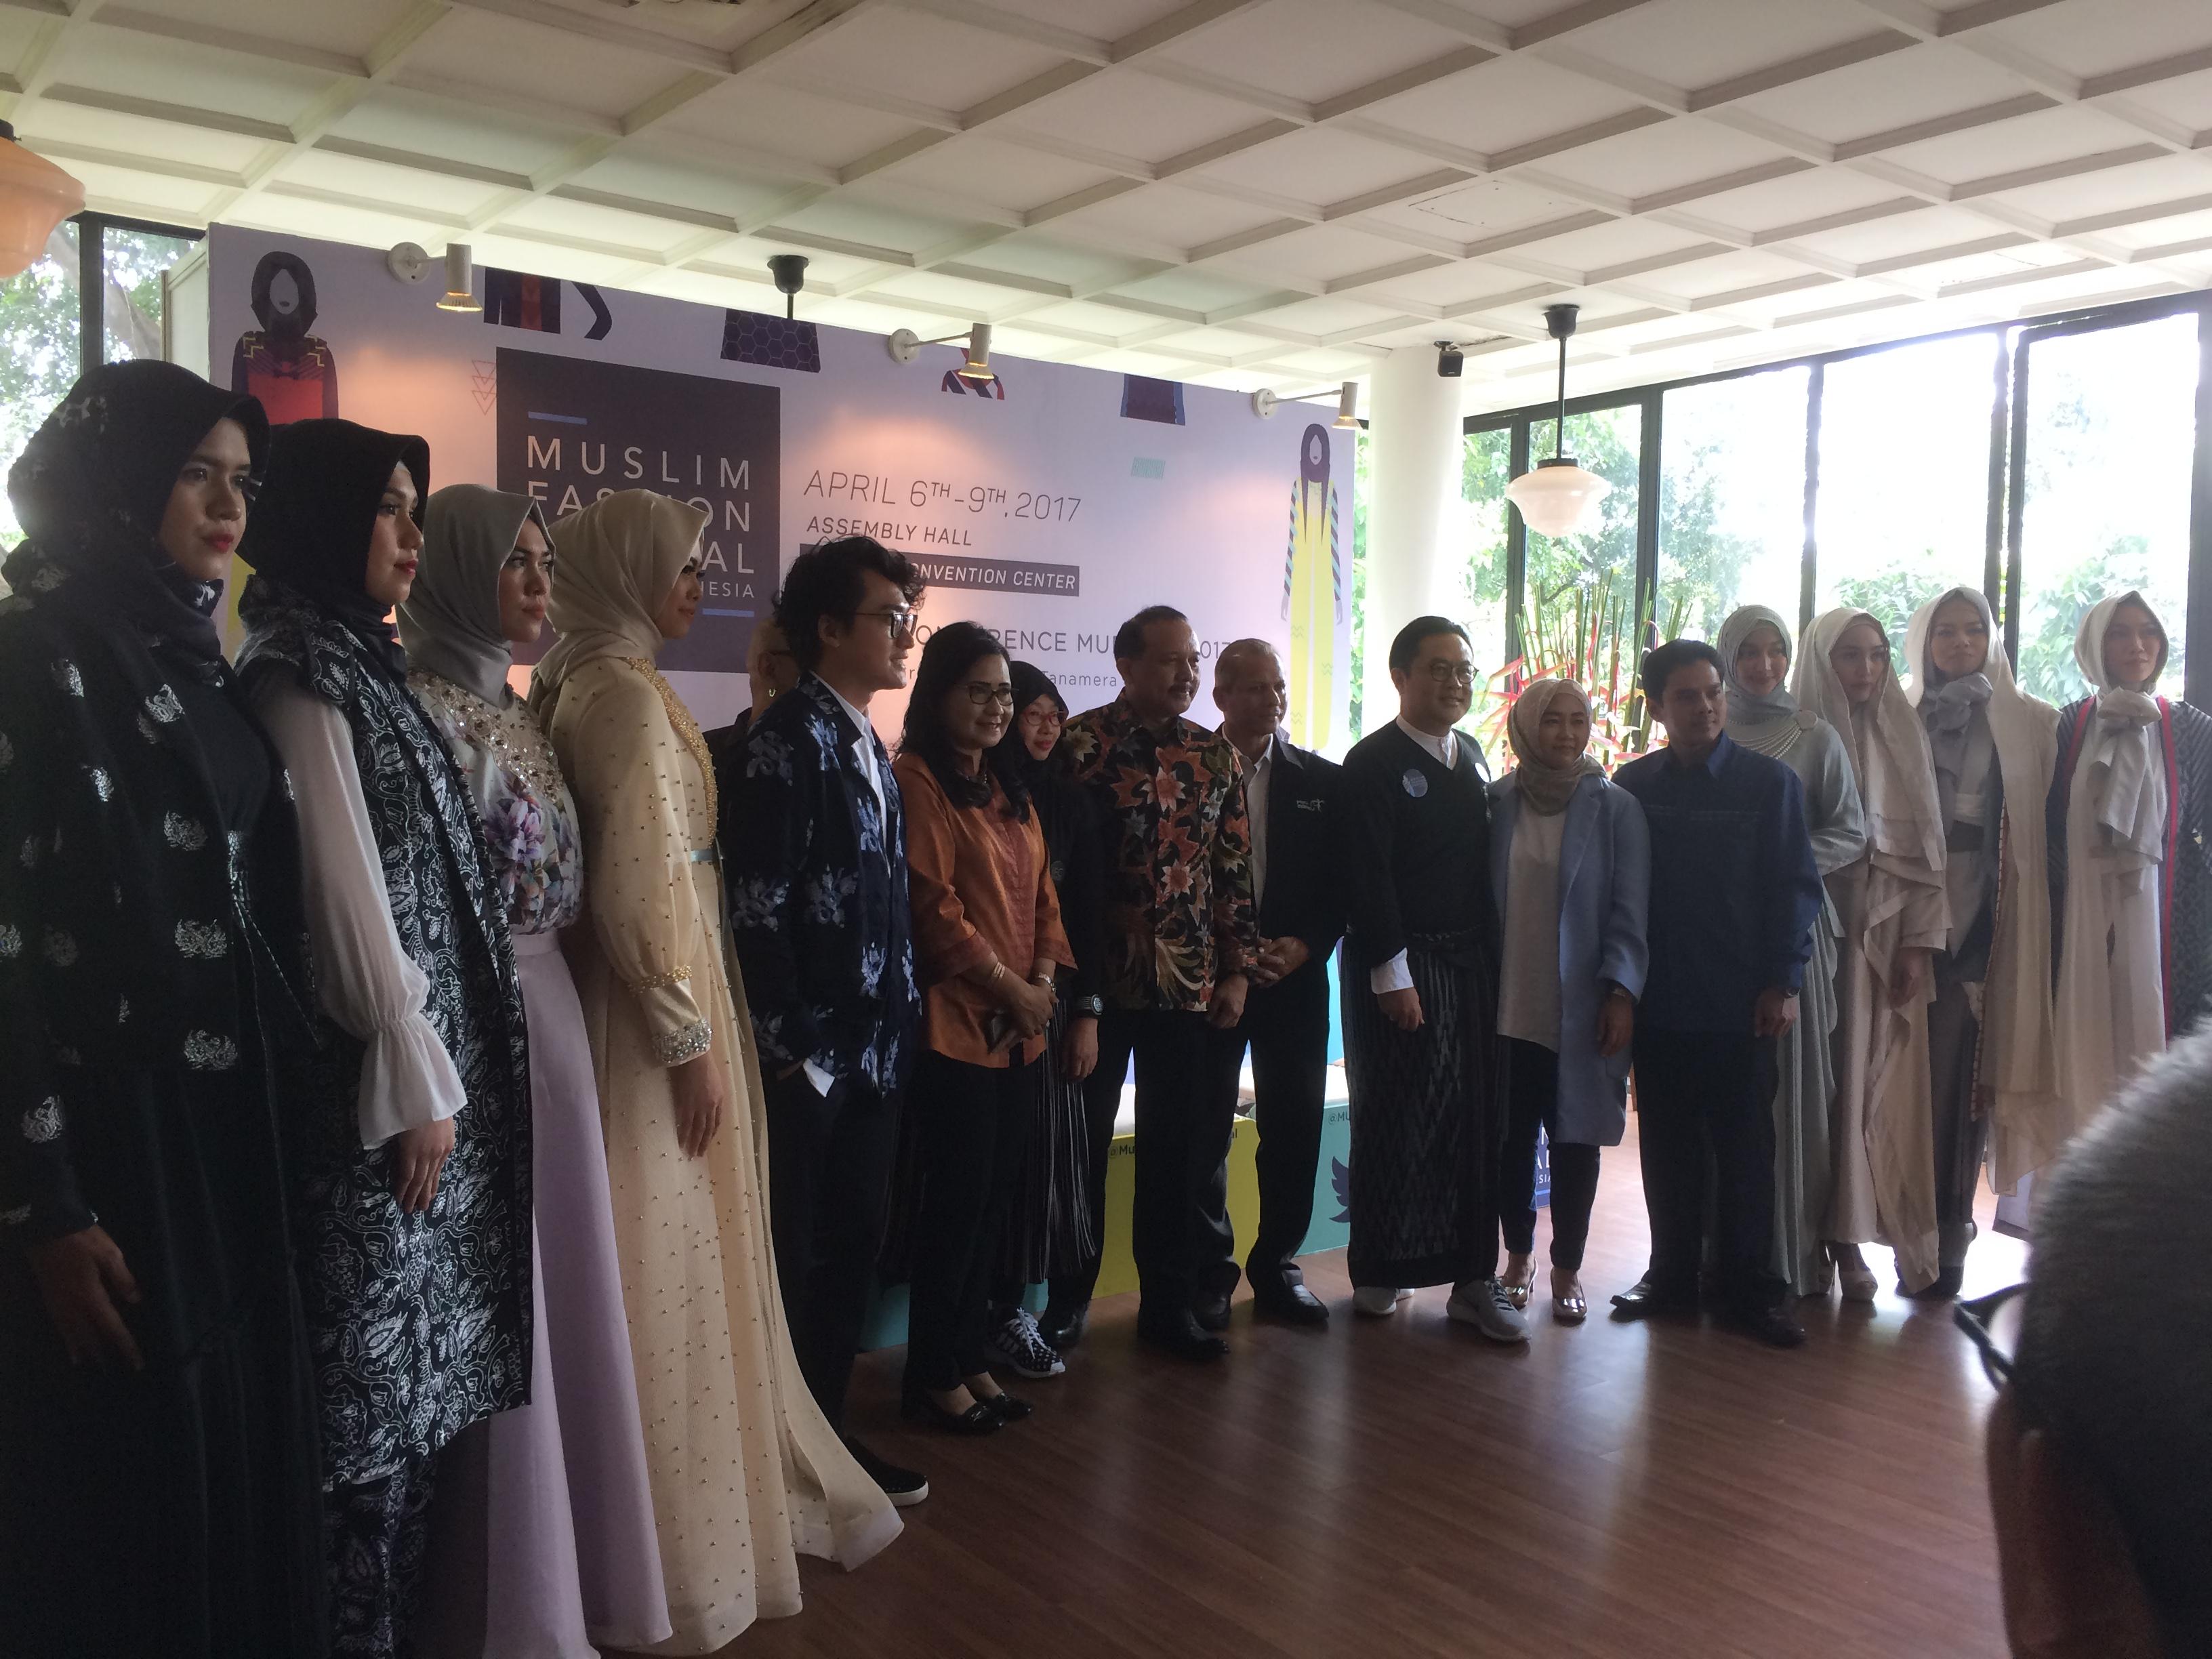 Muslim Fashion Festival segera digelar di Jakarta